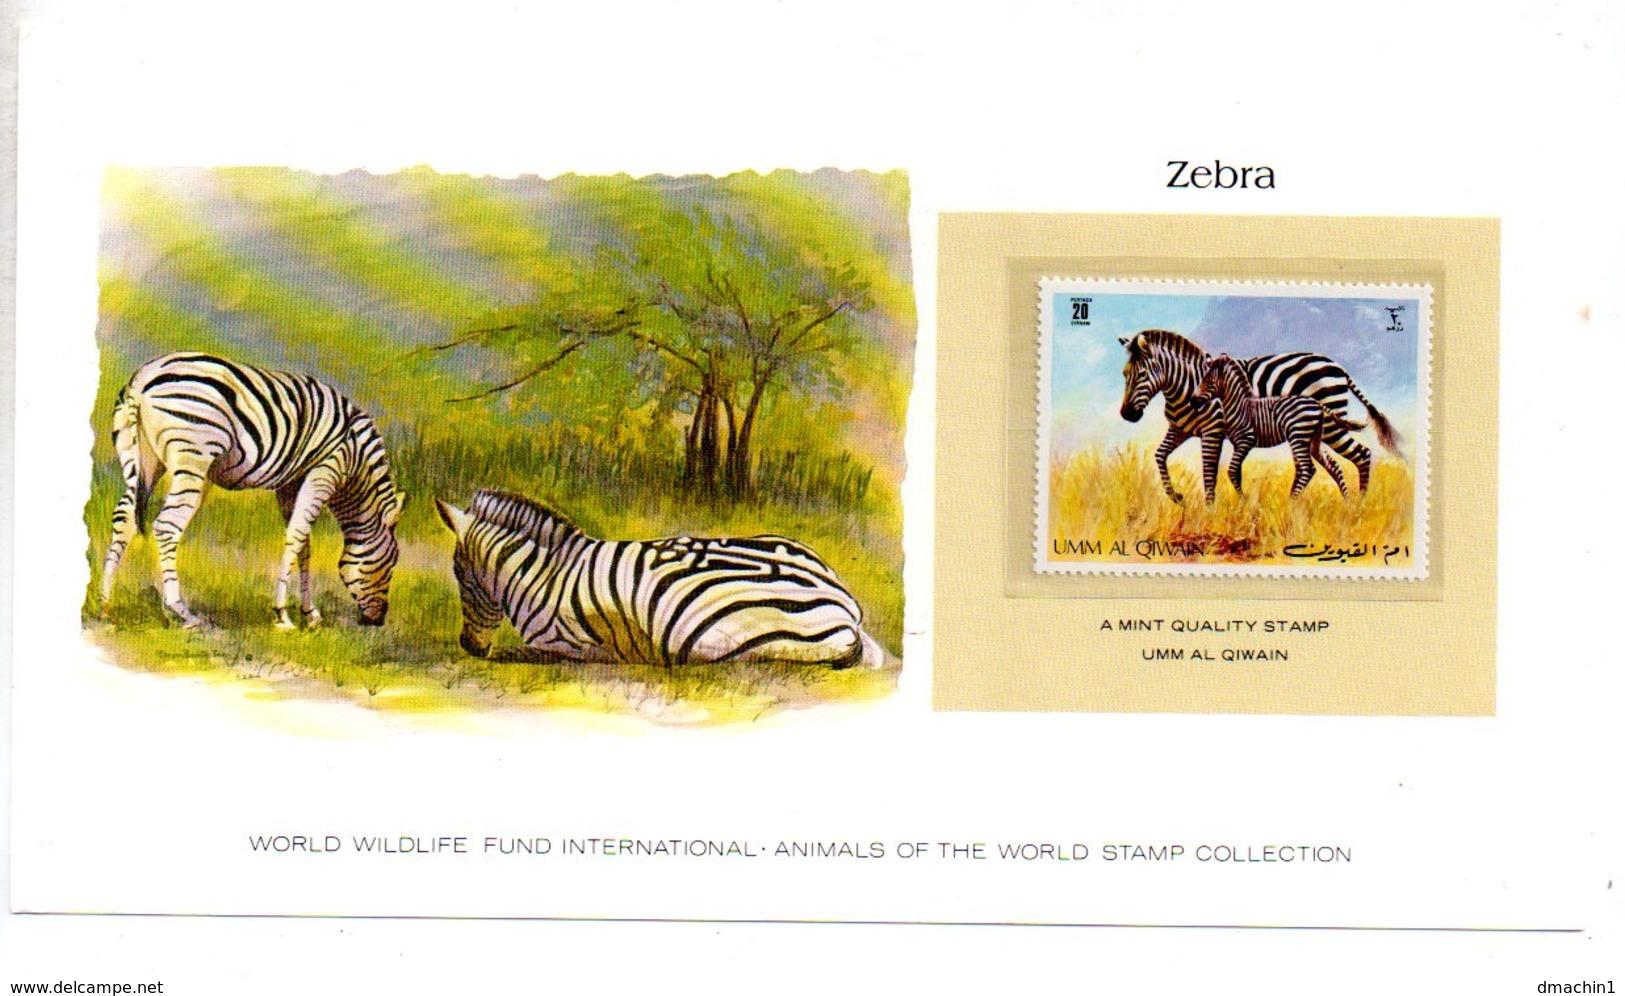 Animals Of The Worl Stamp Collection - Zebra -Al Qiwain-voir état - Stamps